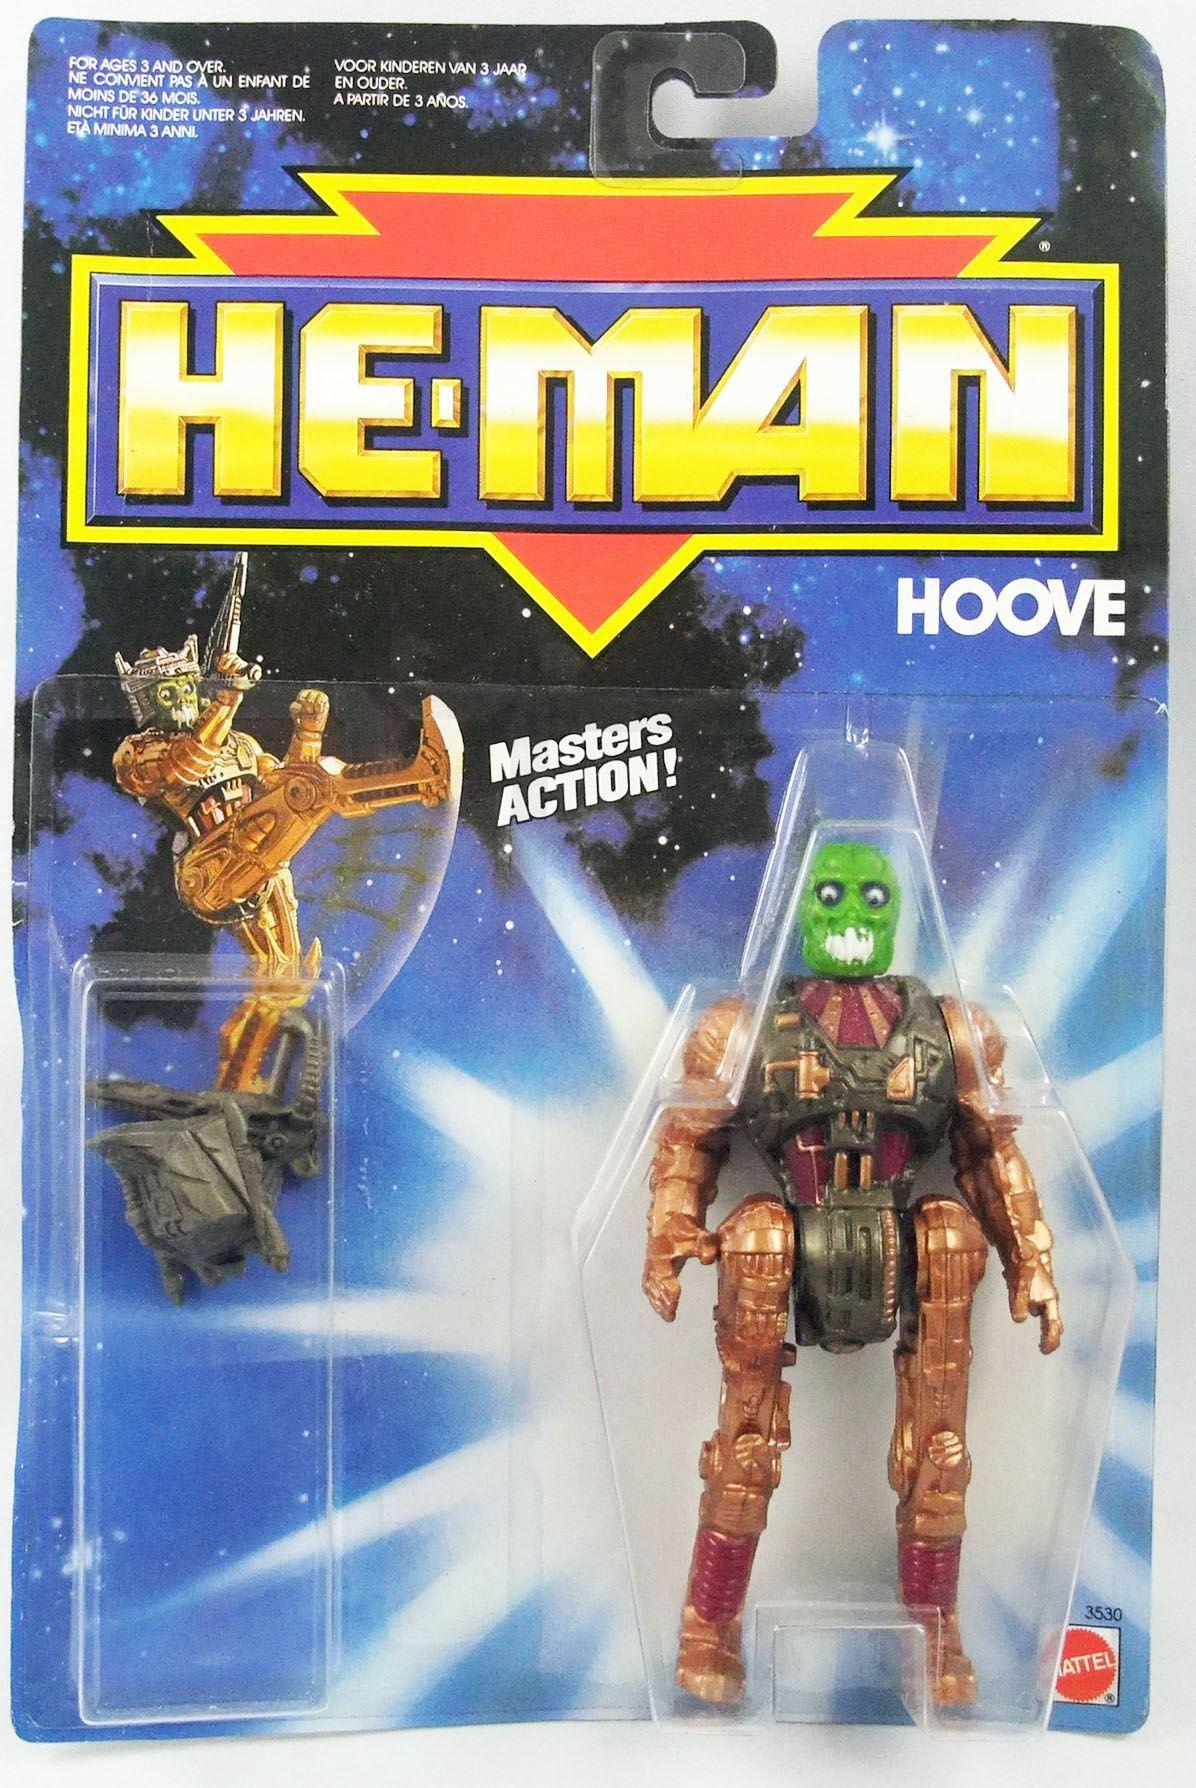 MOTU New Adventures of He-Man - Hoove (carte Europe)